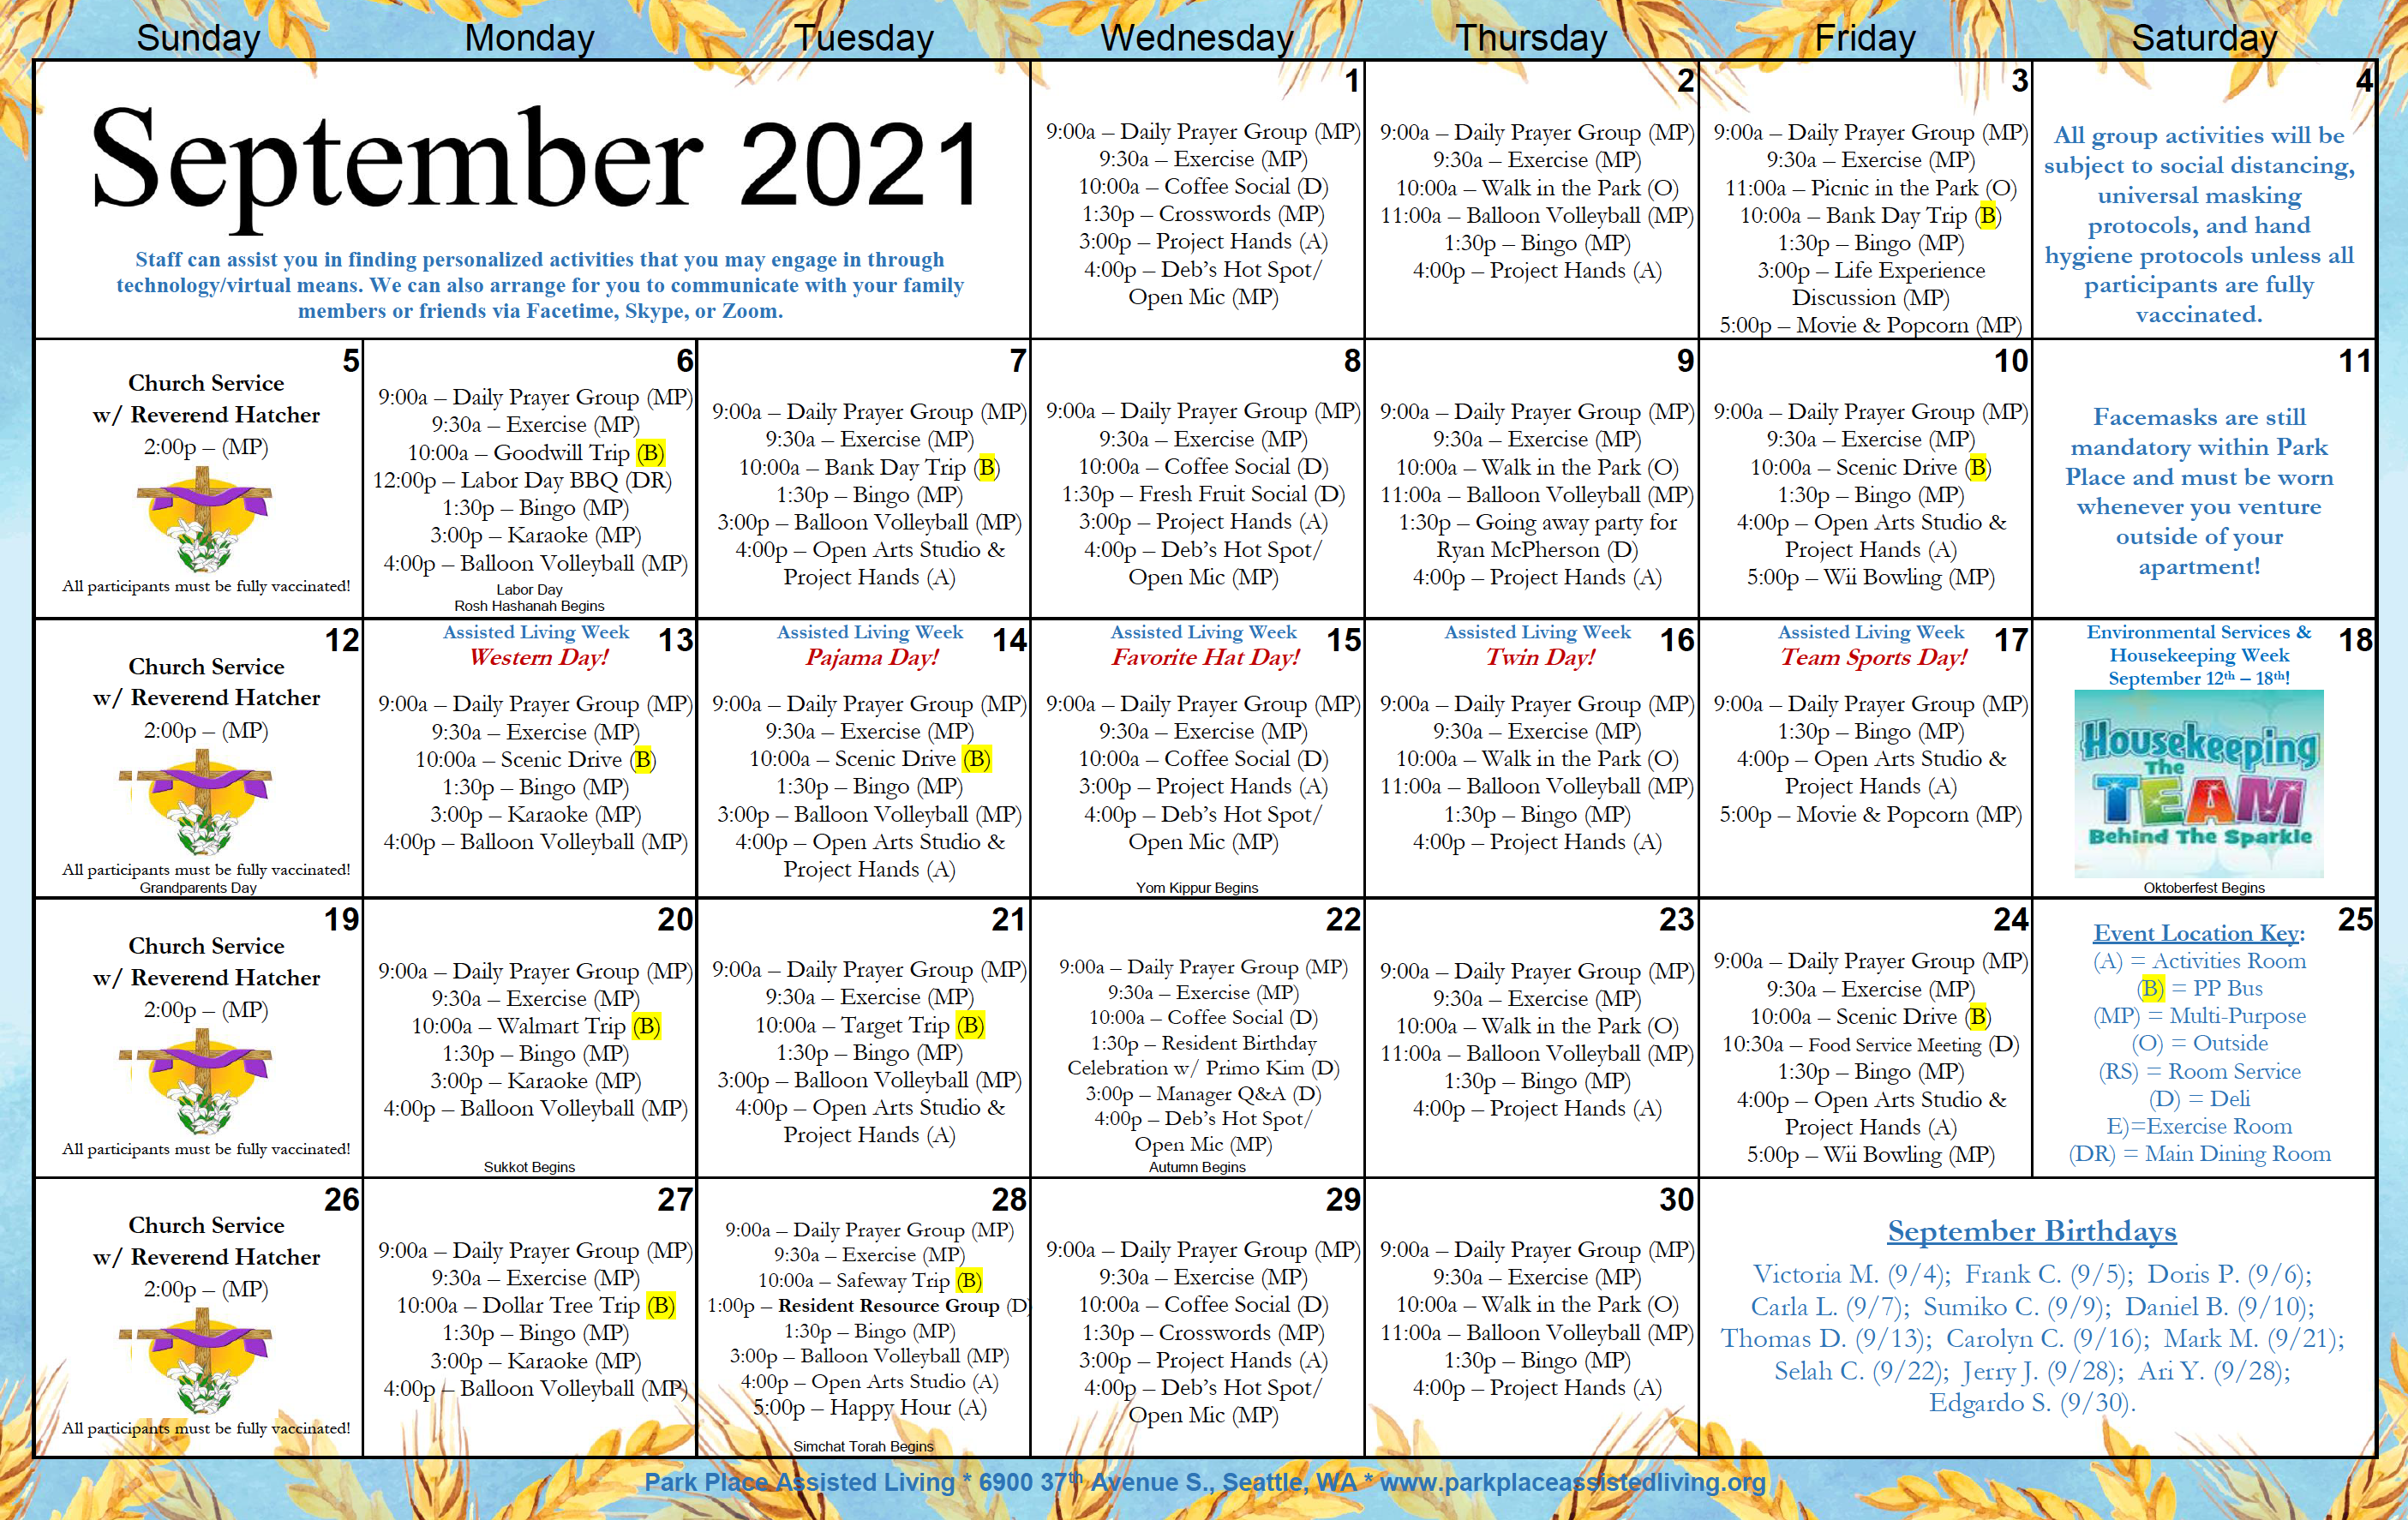 Park Place September 2021 Calendar